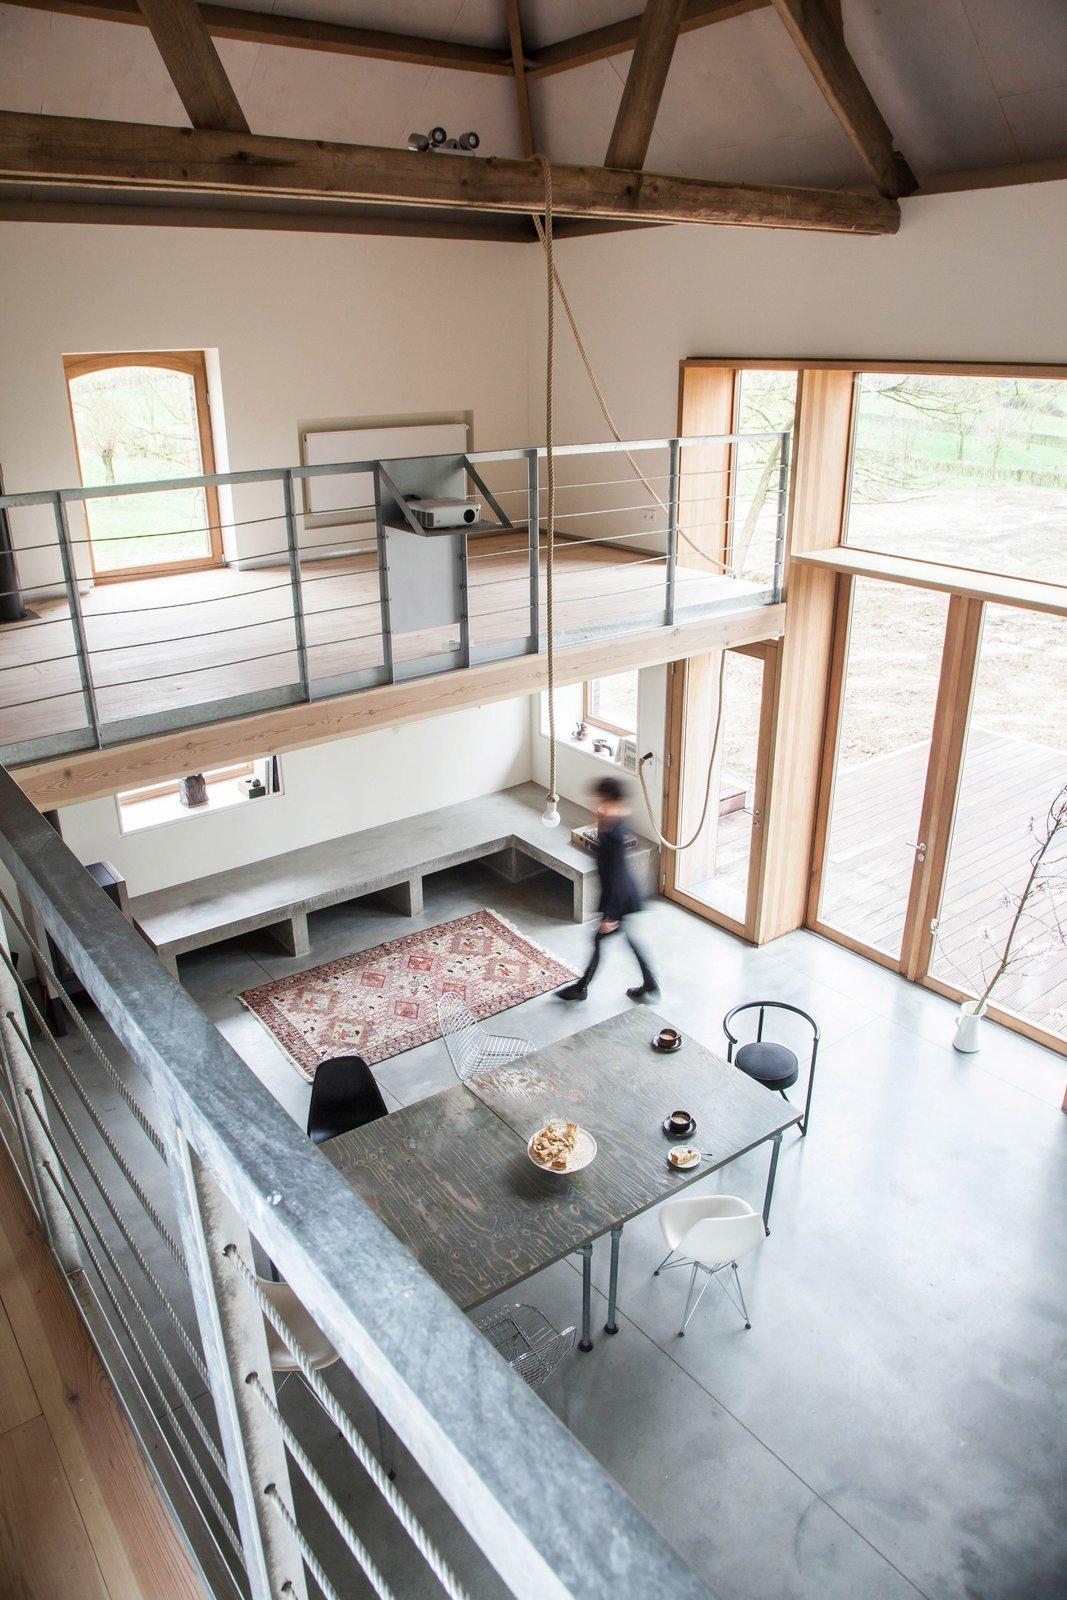 Photo 1 of 7 in Farm Grubbehoeve by Jeanne Dekkers Architecture